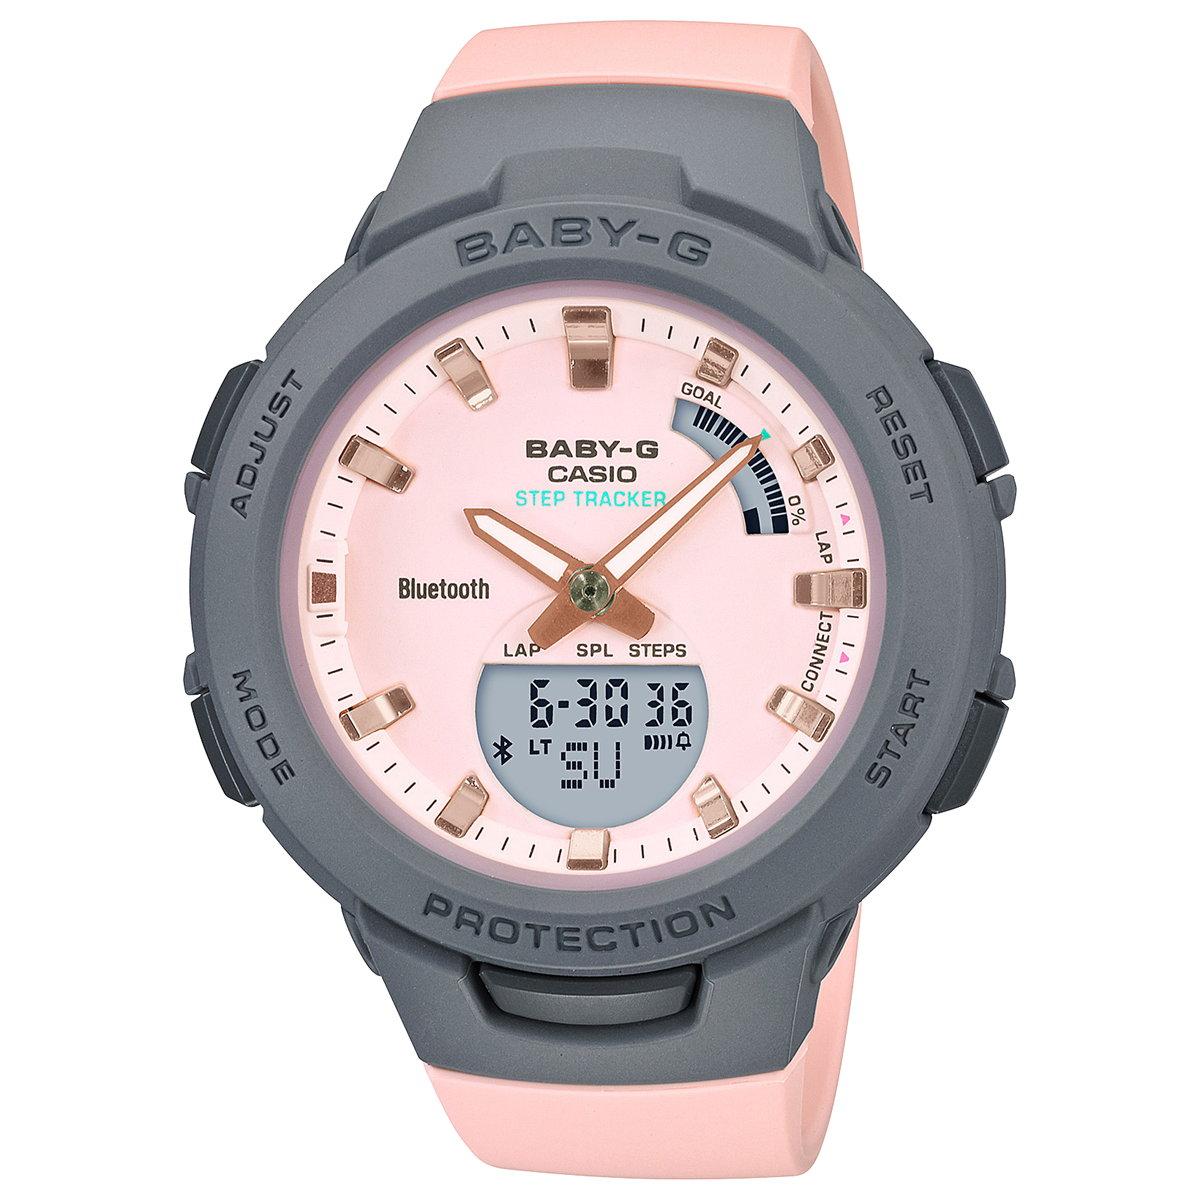 BABY-G カシオ ベビーG レディース 腕時計 BSA-B100MC-4AJF